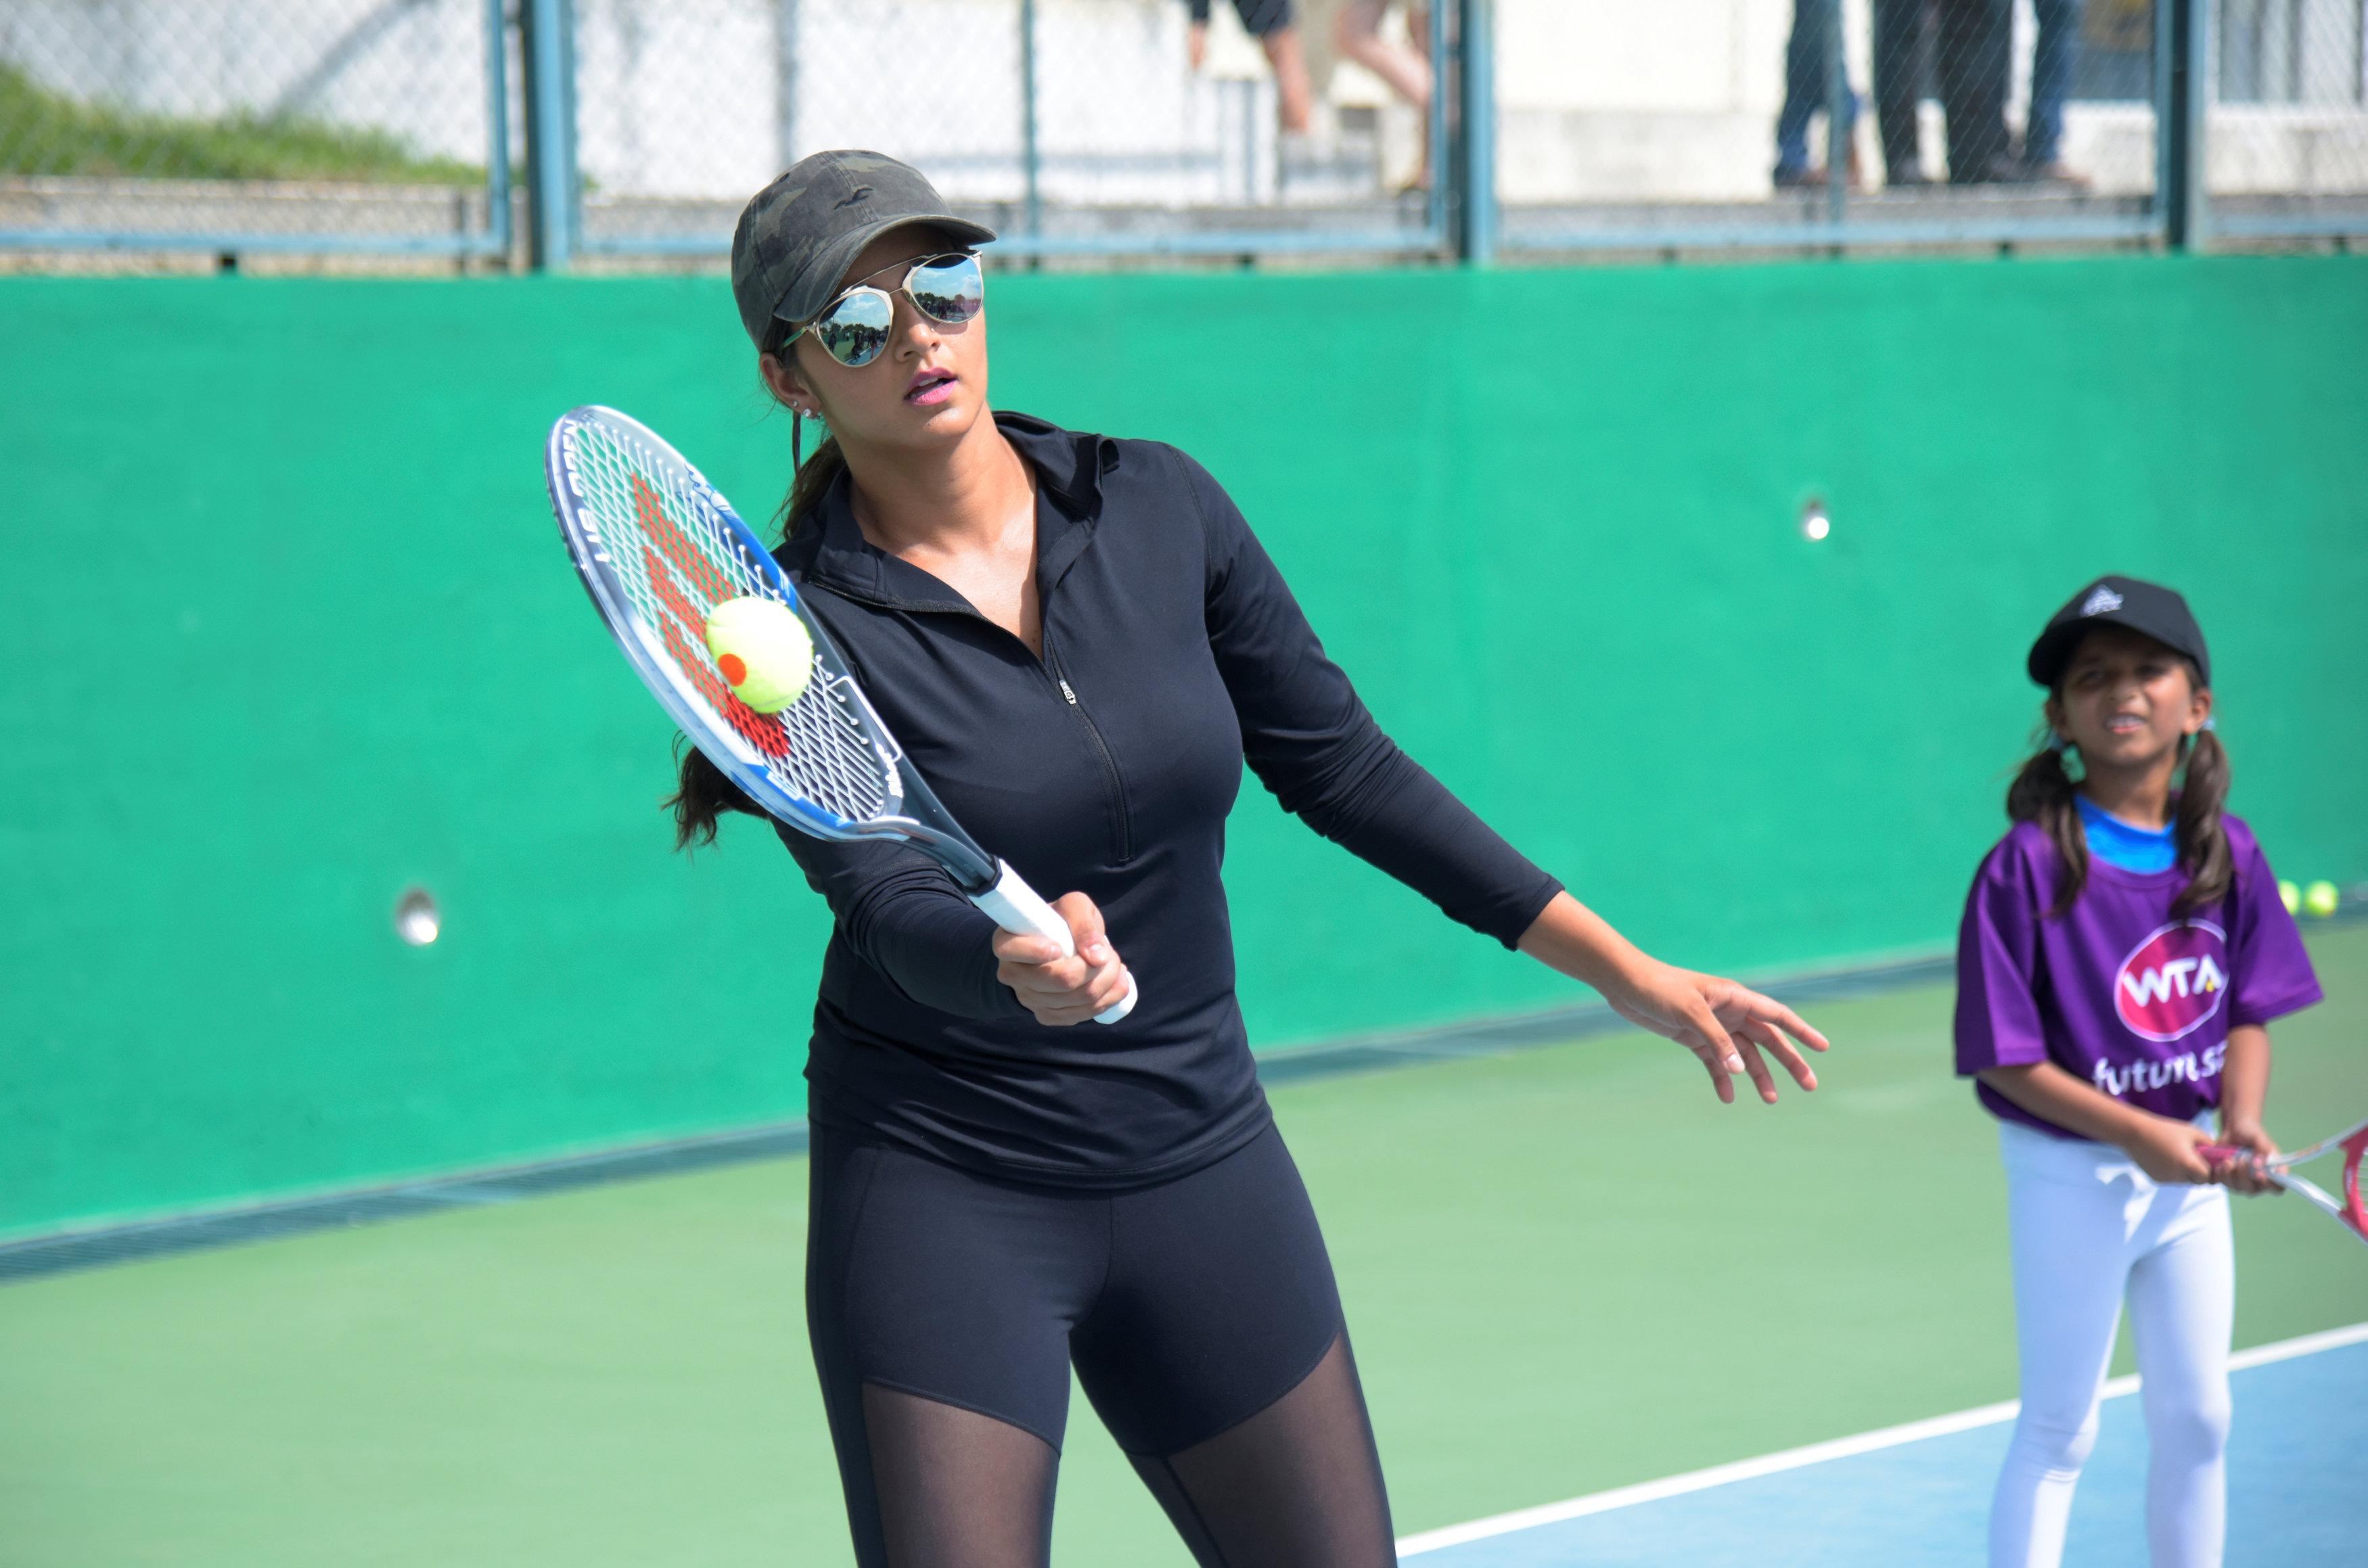 Tennis - WTA Future Stars Masterclass With Sania Mirza and Neha Dhupia - Hyderabad, India - July 25 2017   India's number one tennis player Sania Mirza in action during the WTA Future Stars Masterclass   Reuters Plus/ Krishnendu Halder